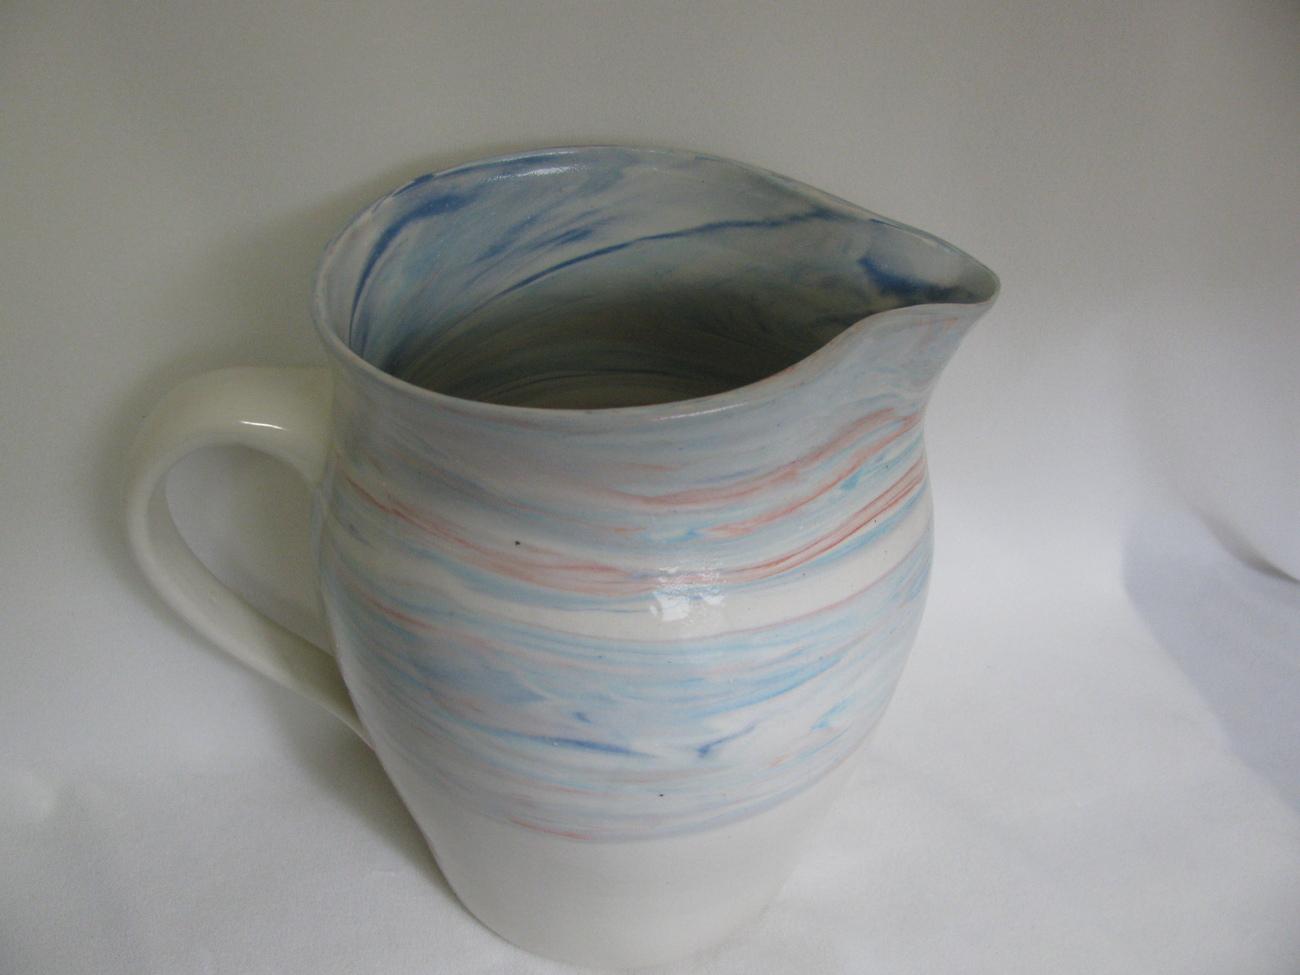 Large Colored Porcelain Pitcher RKC032